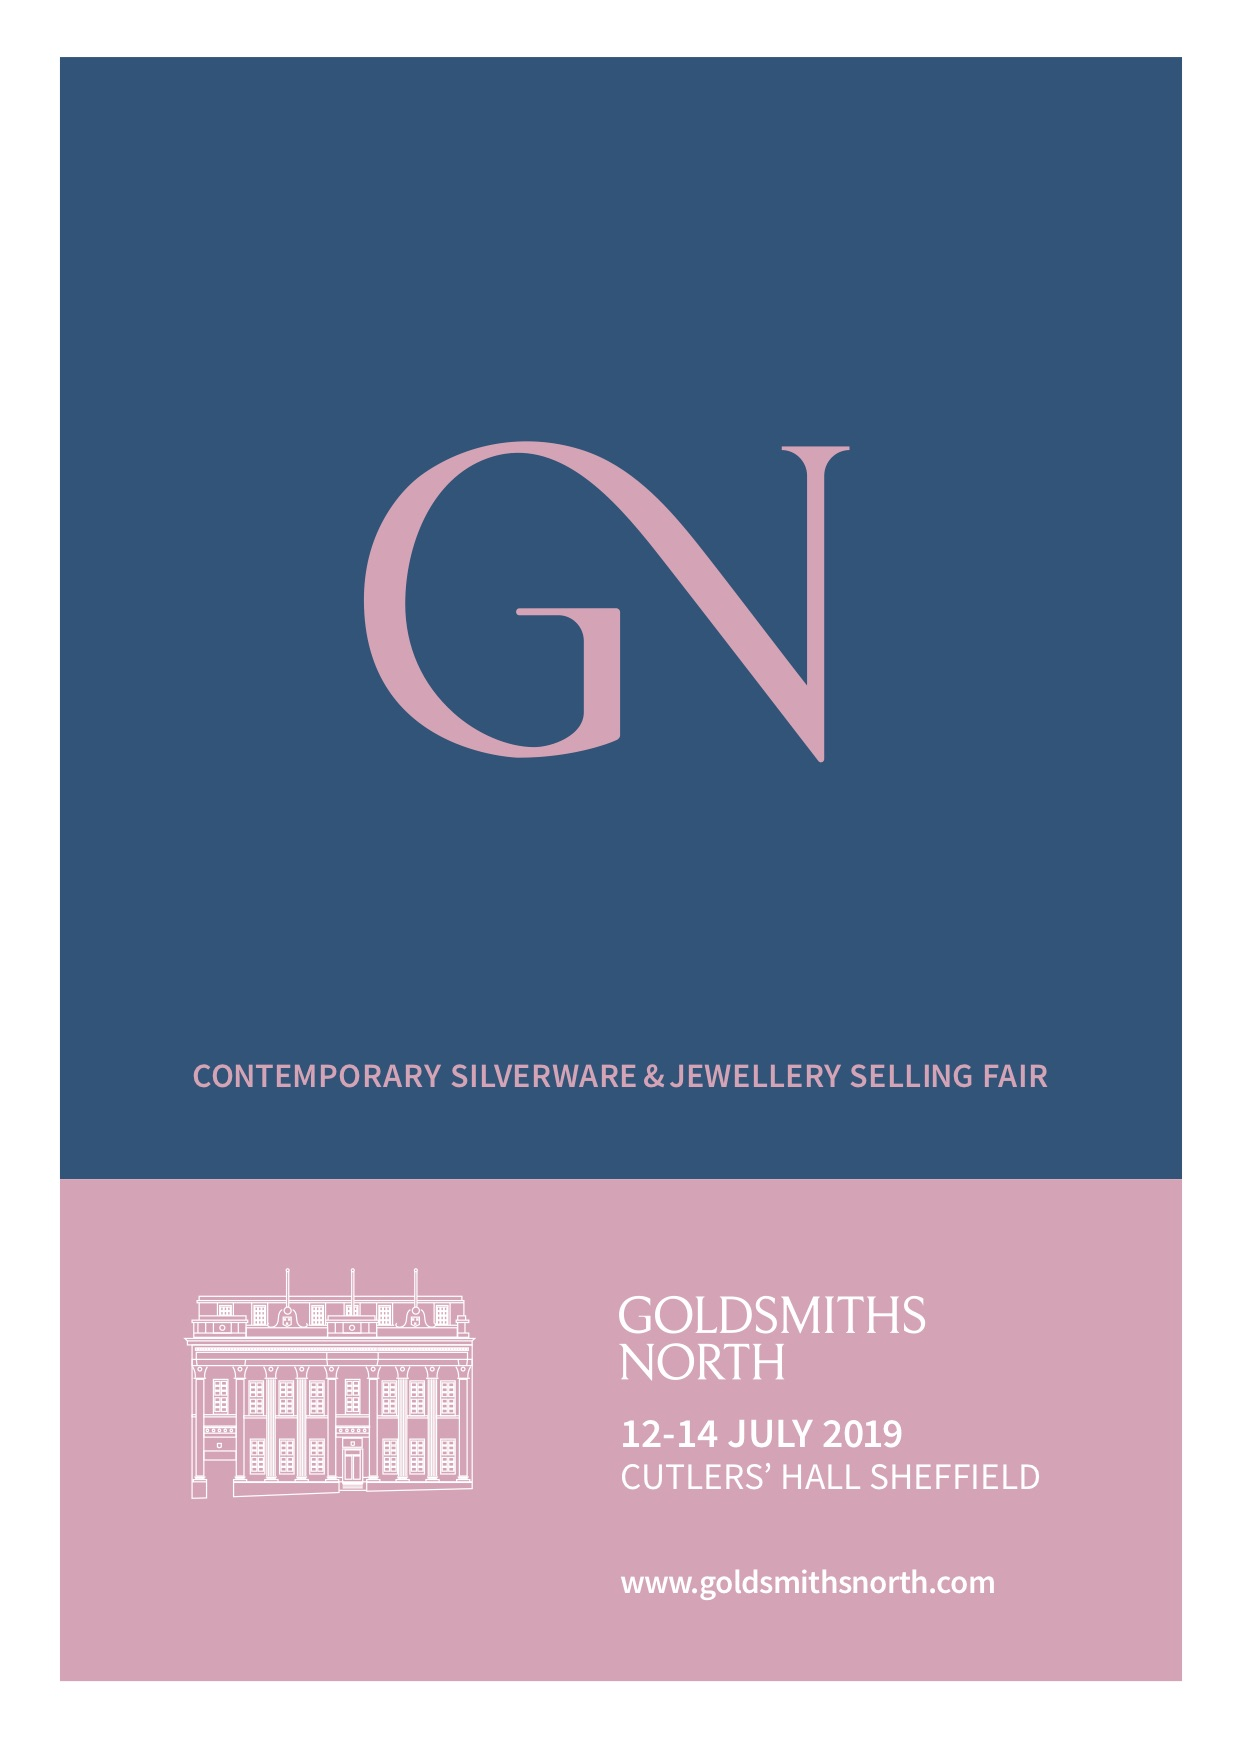 Goldsmiths North Blue_Pink Flyer copy.jpg